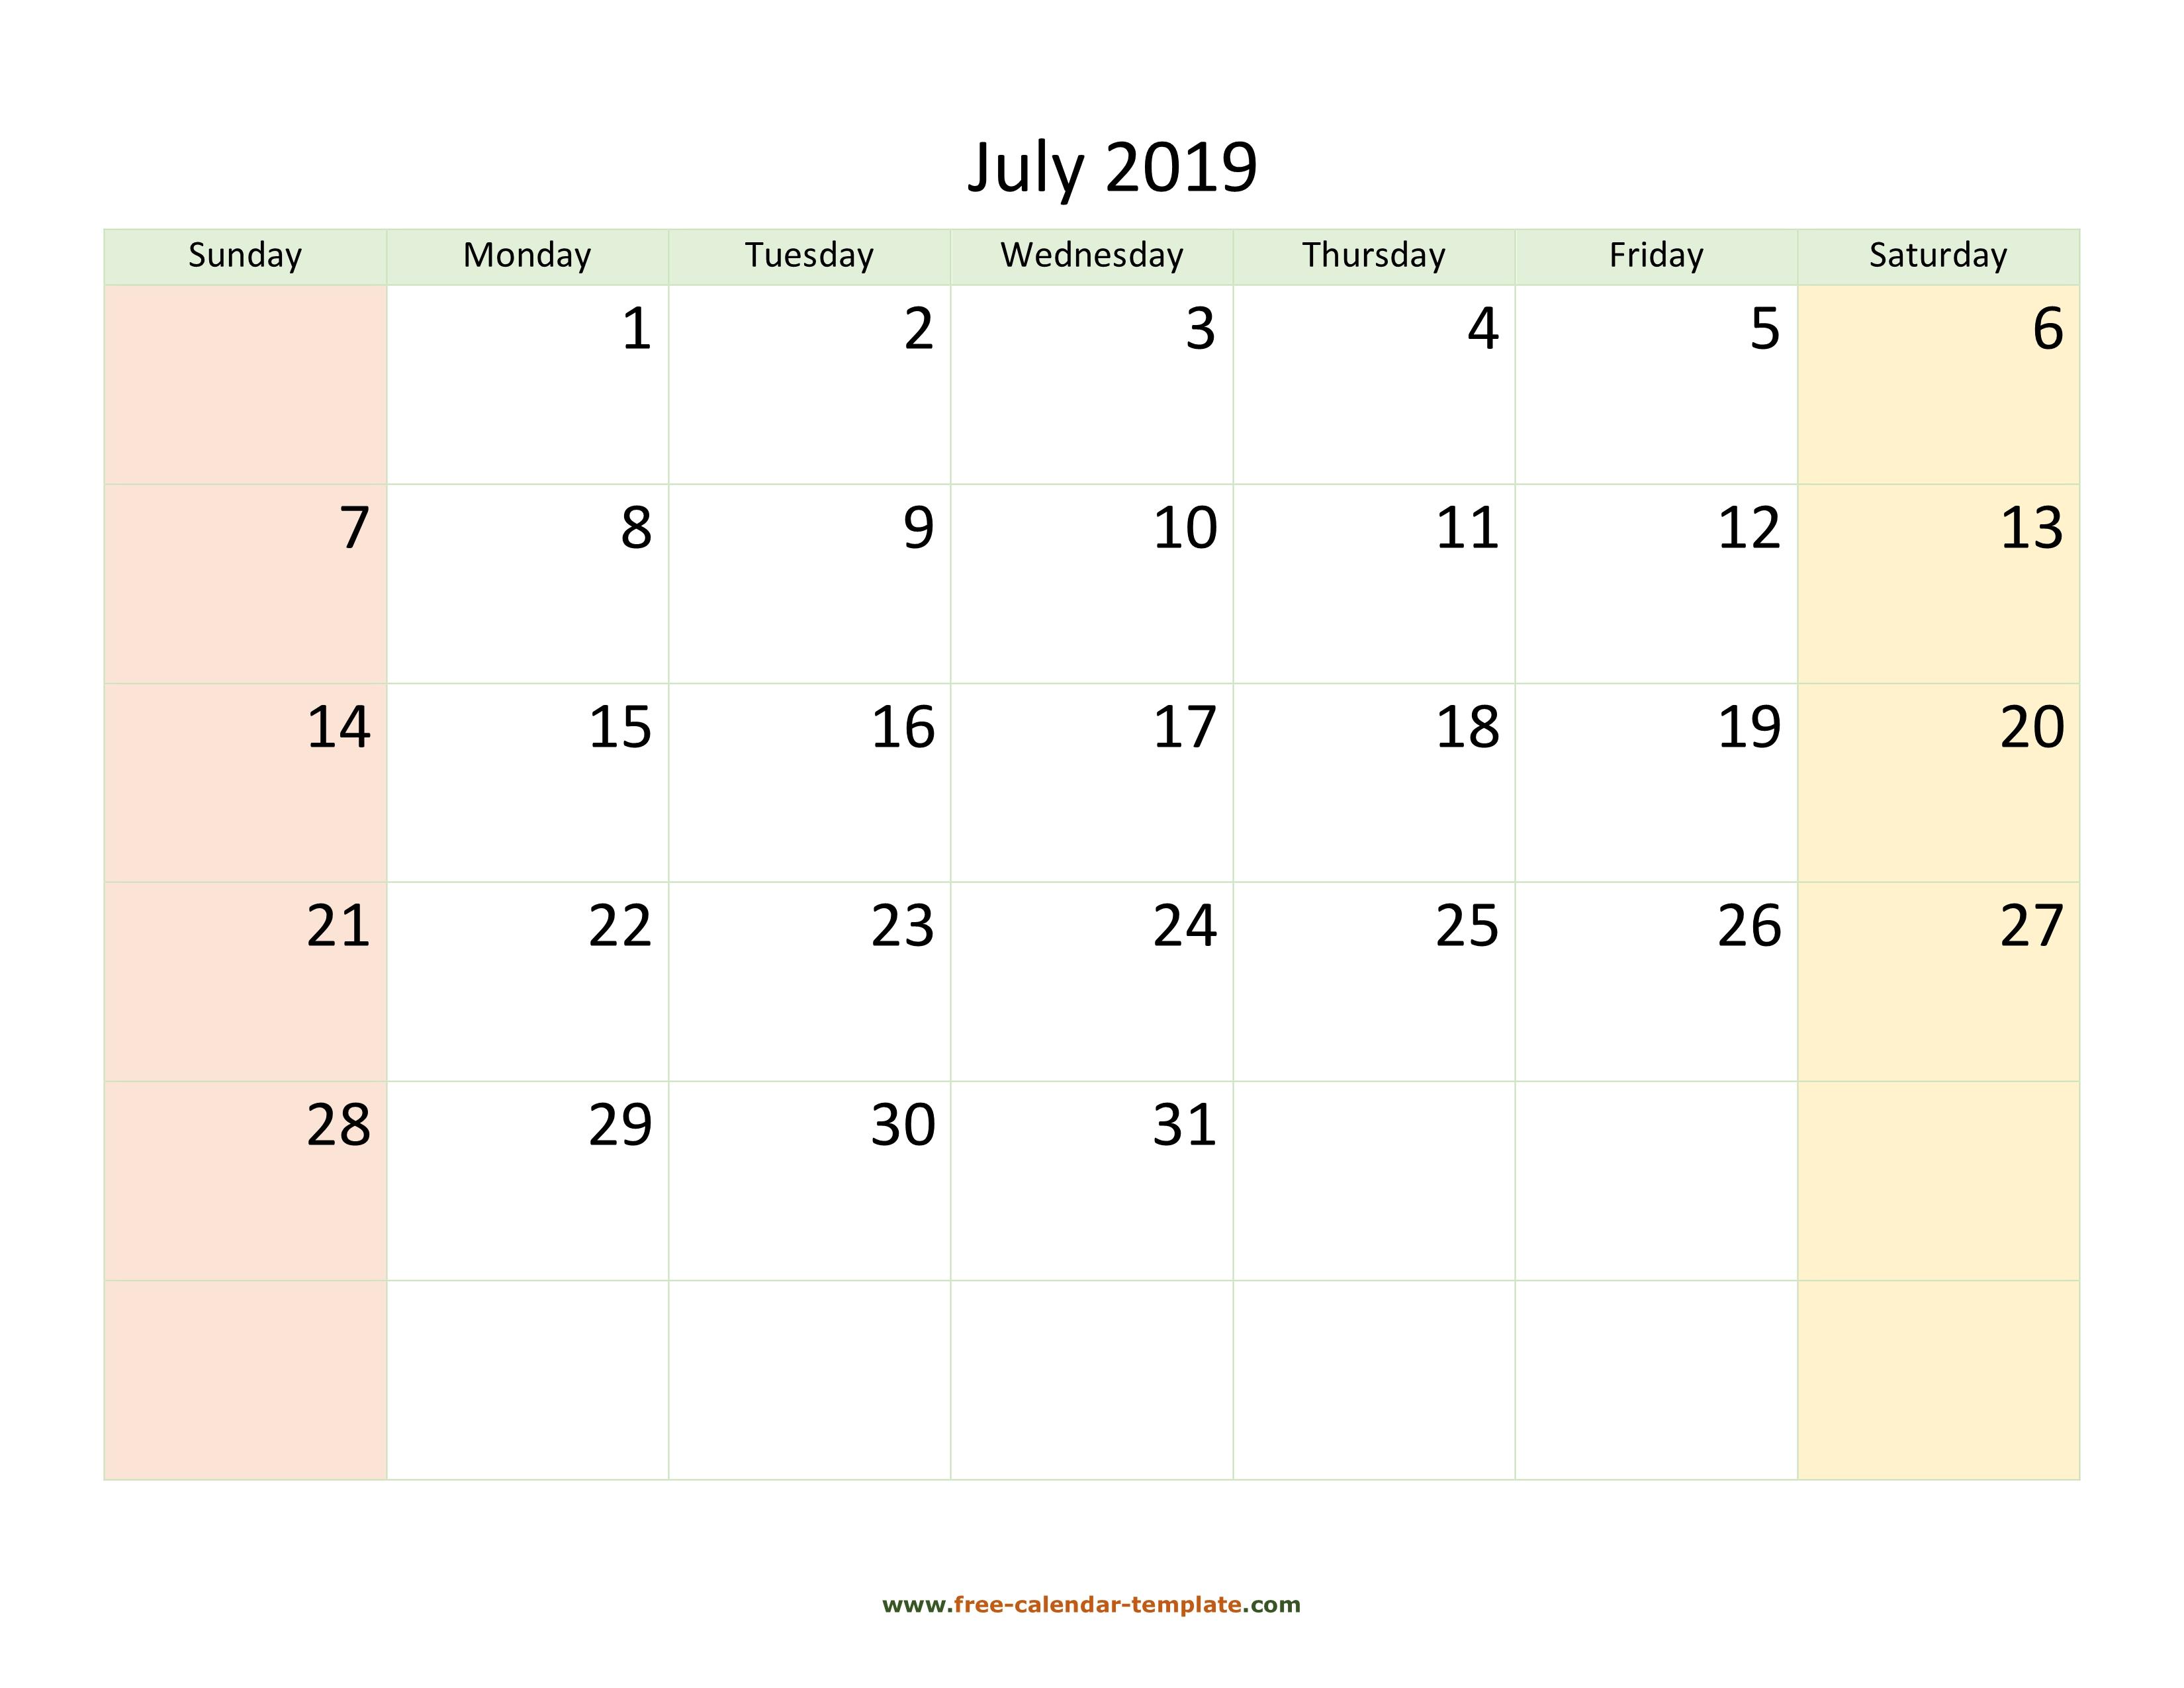 photo regarding July Calendar Printable titled July 2019 Calendar Printable with coloring upon weekend